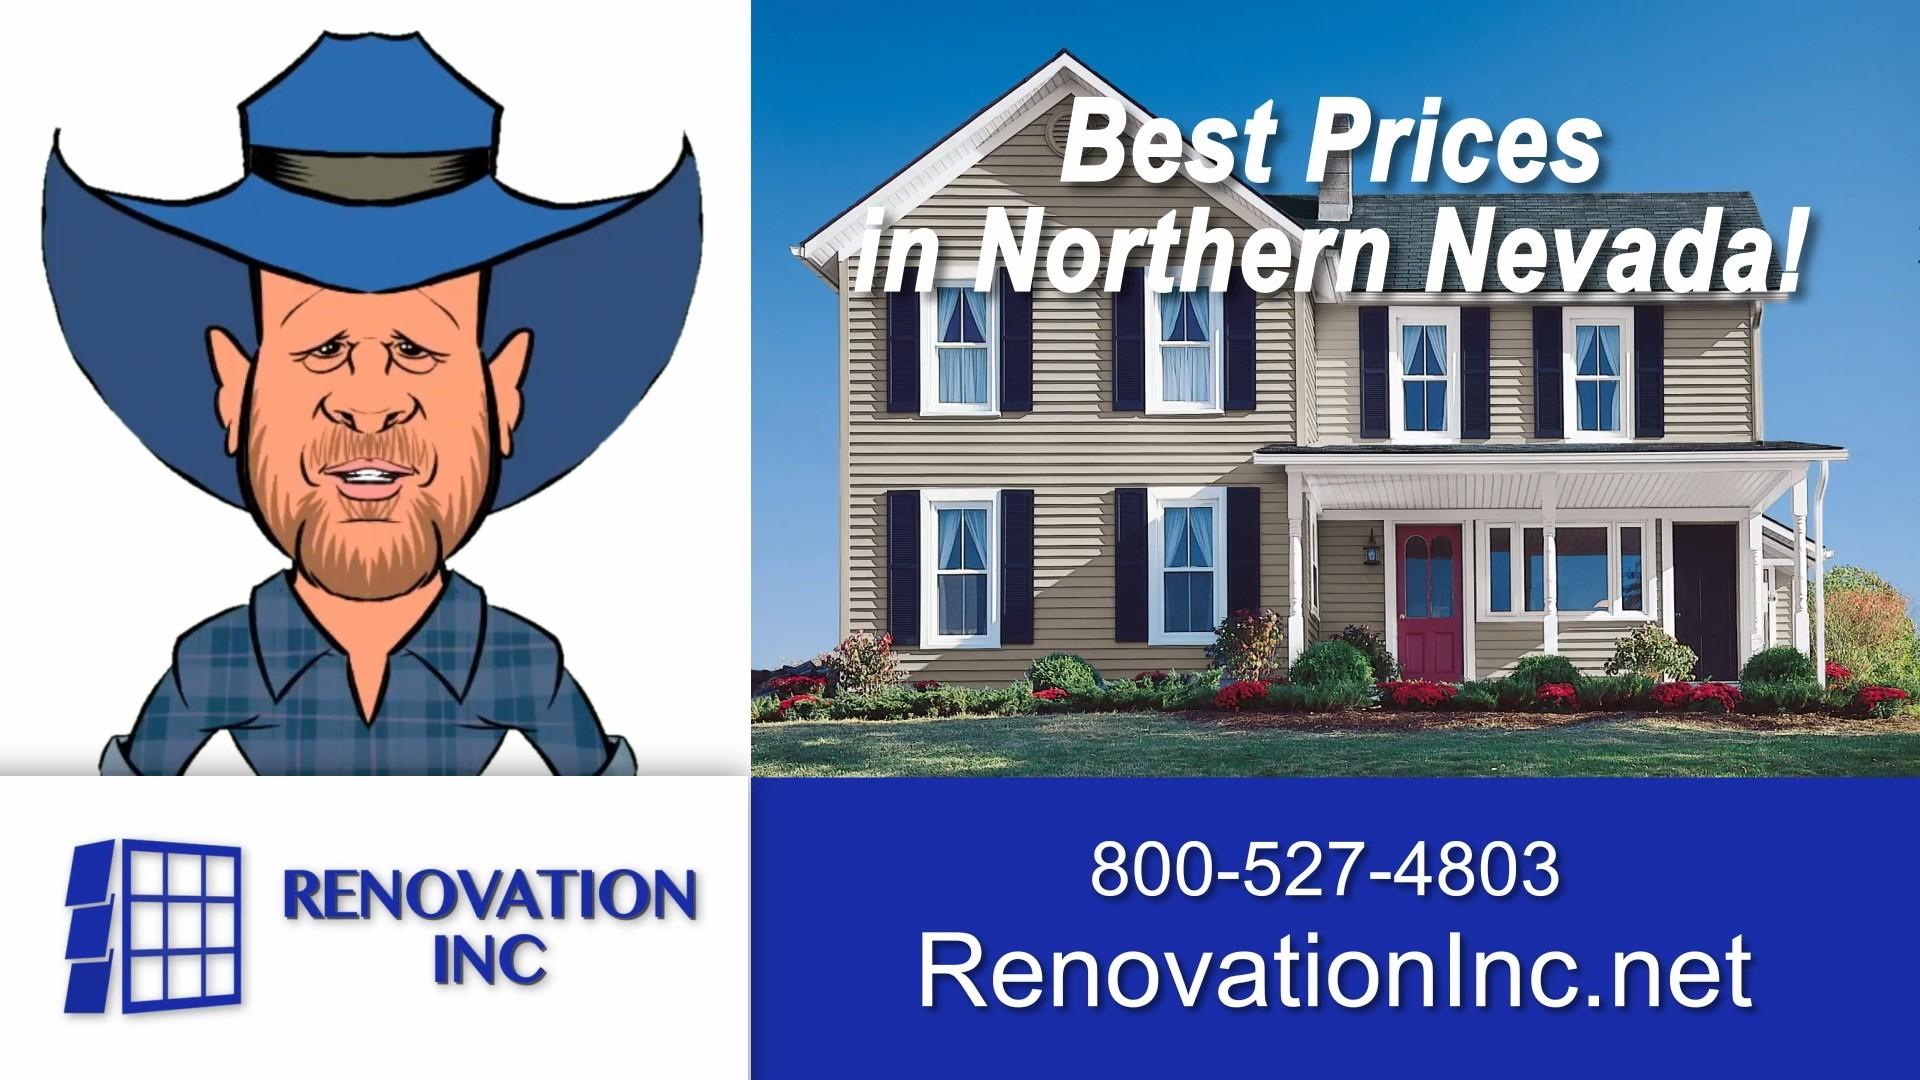 Renovation Inc: Wild Bill - Siding